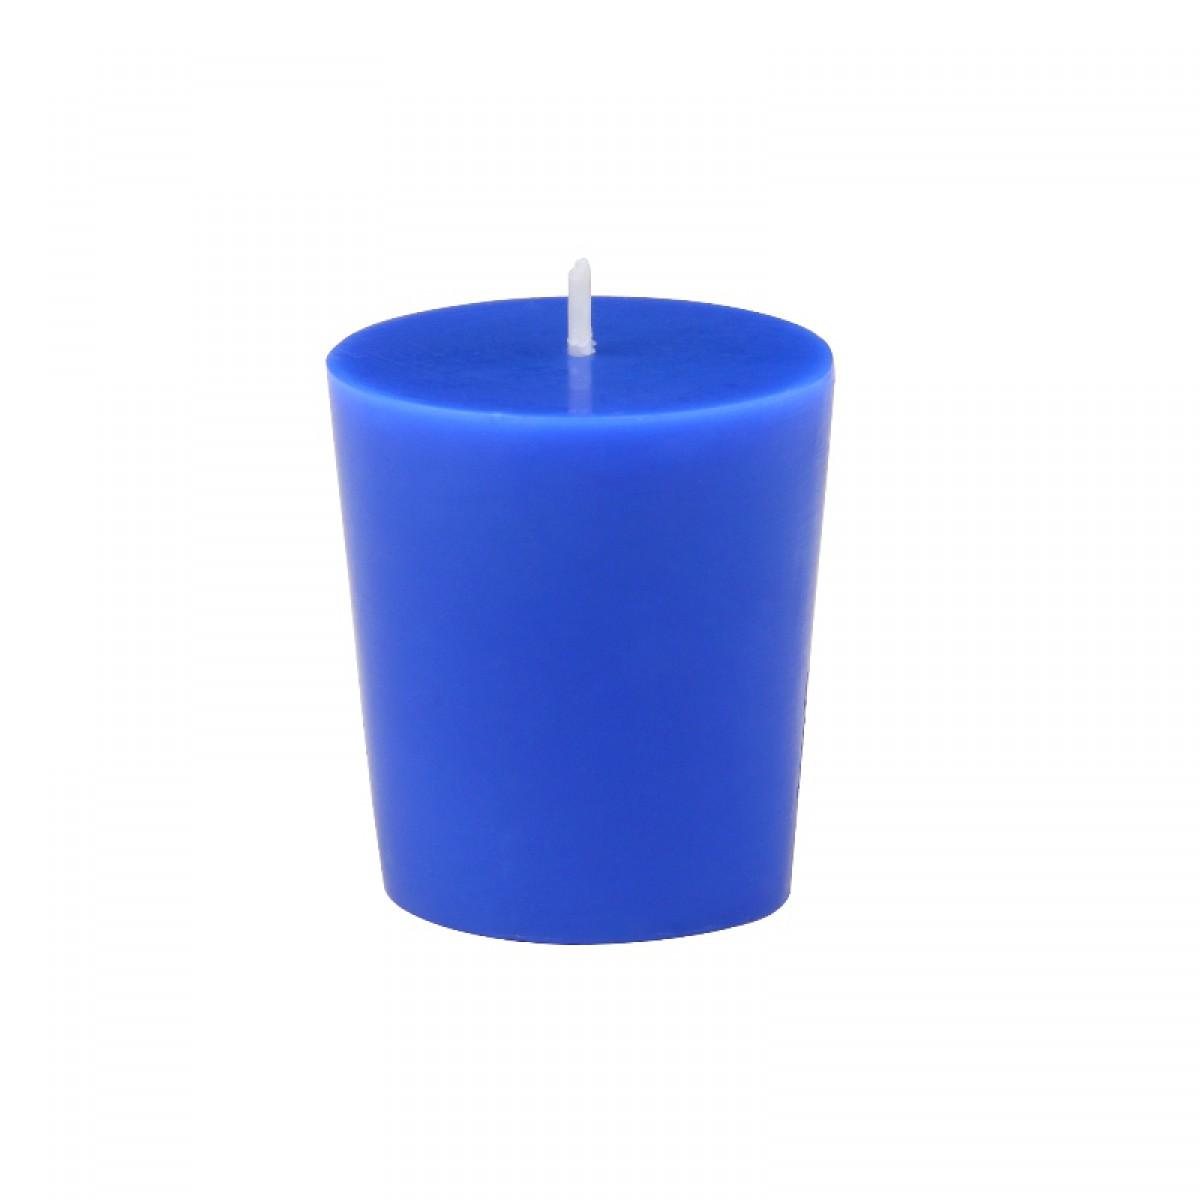 home blue votive candles 96pc case bulk. Black Bedroom Furniture Sets. Home Design Ideas